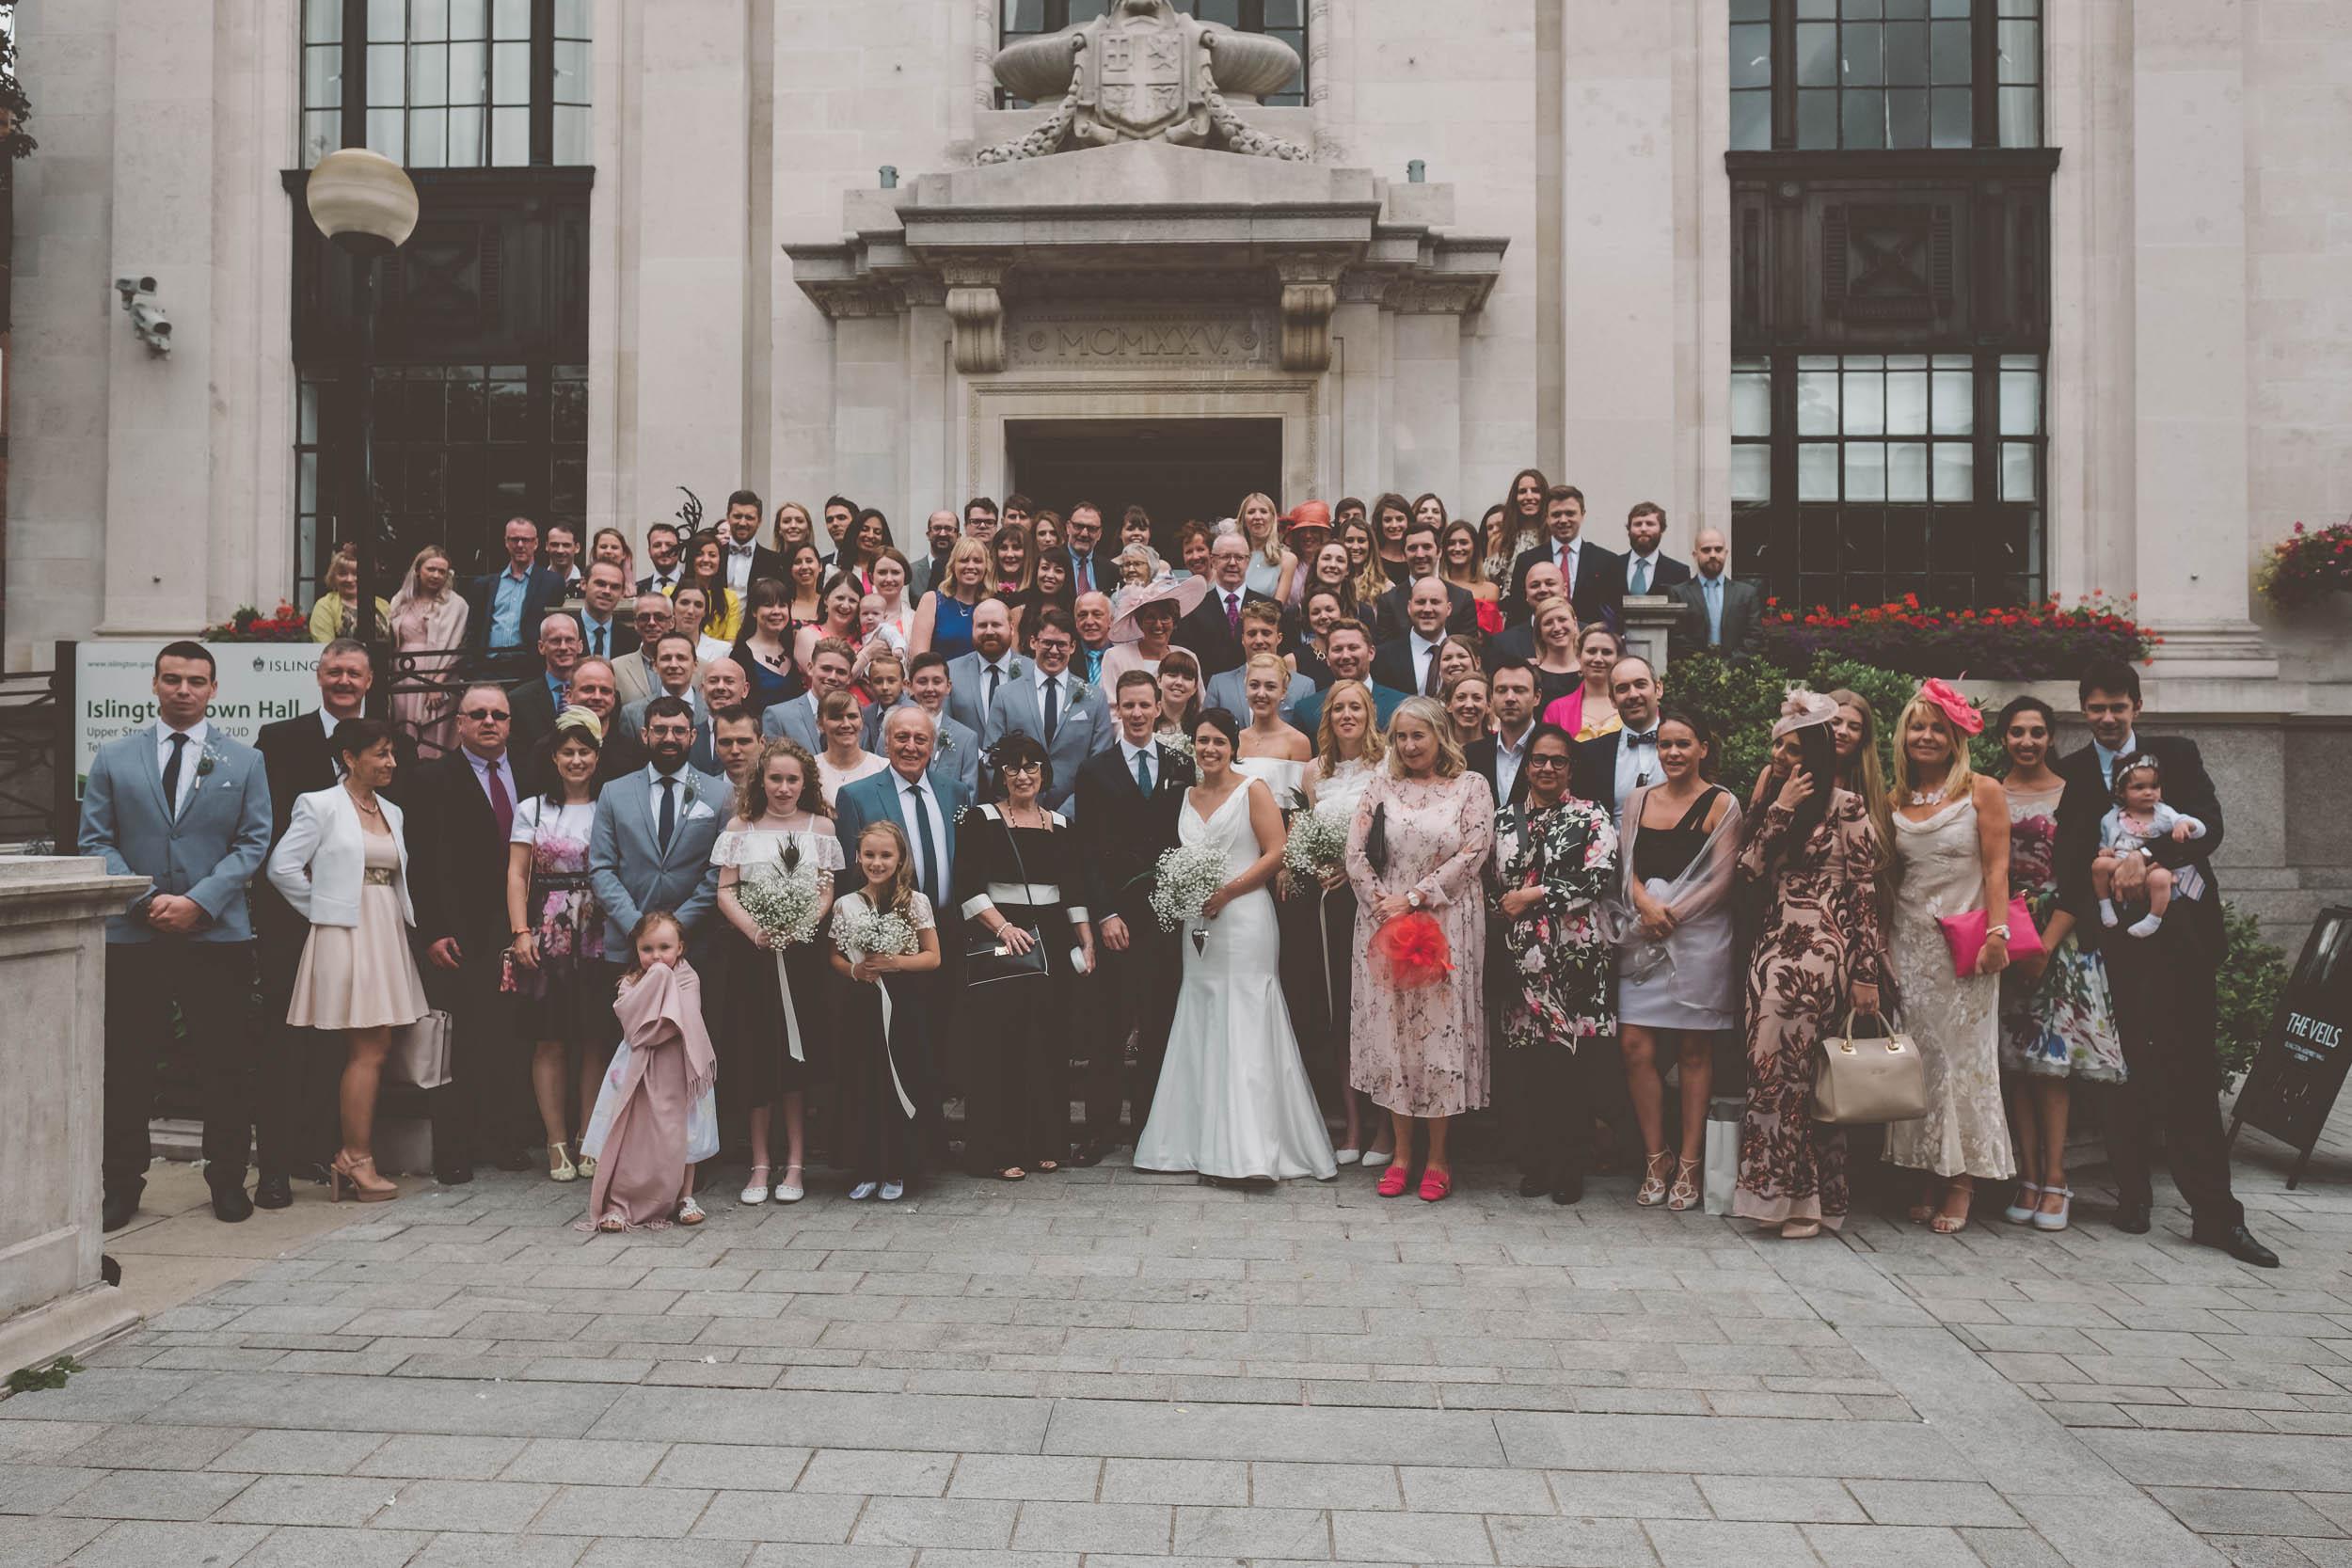 islington-town-hall-4th-floor-studios-wedding166.jpg